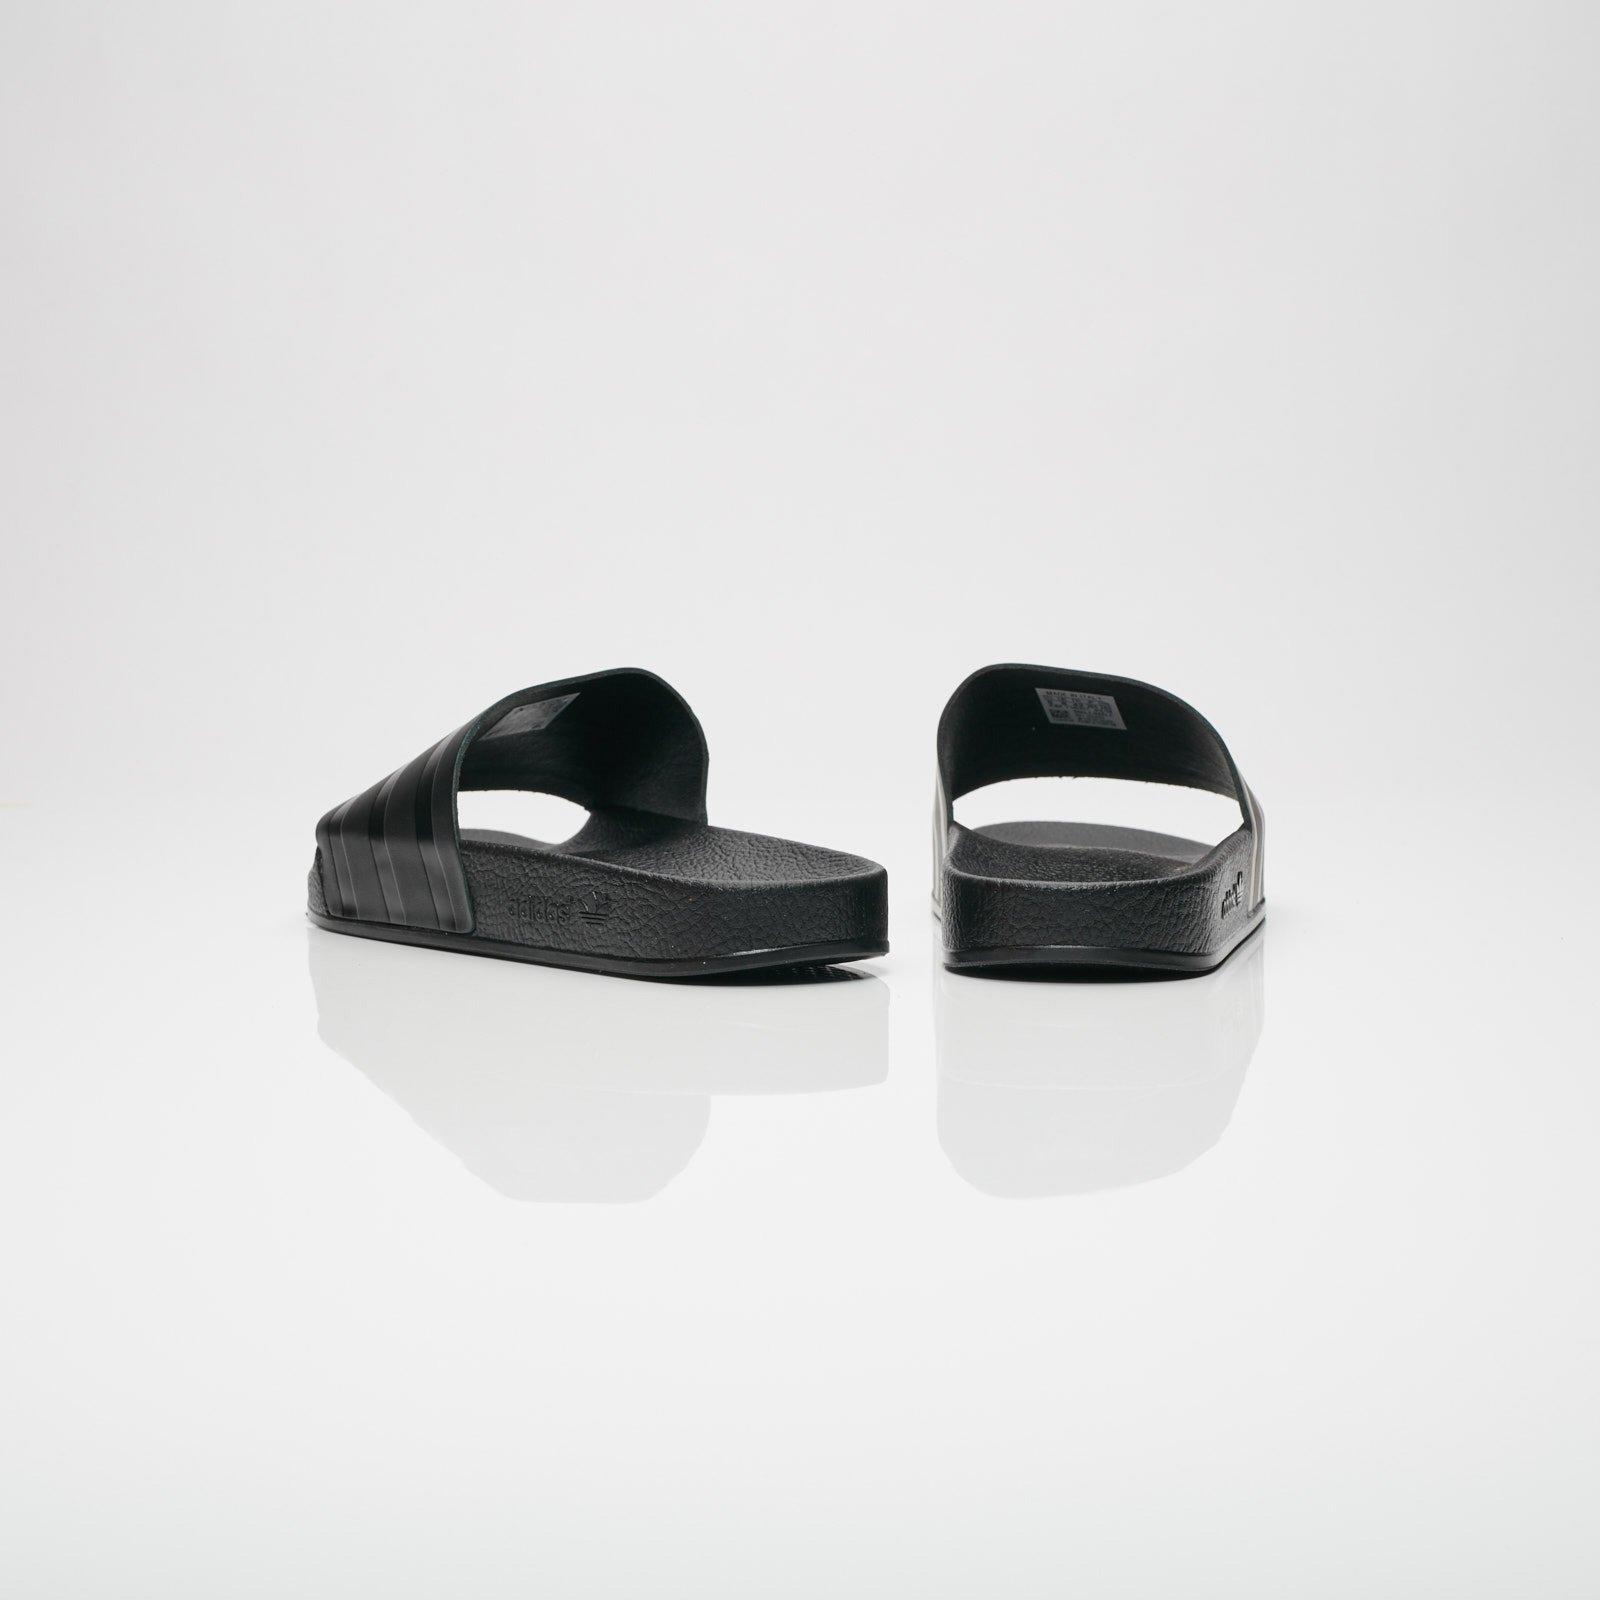 9da44c3c2f74 adidas Adilette - Cq3094 - Sneakersnstuff